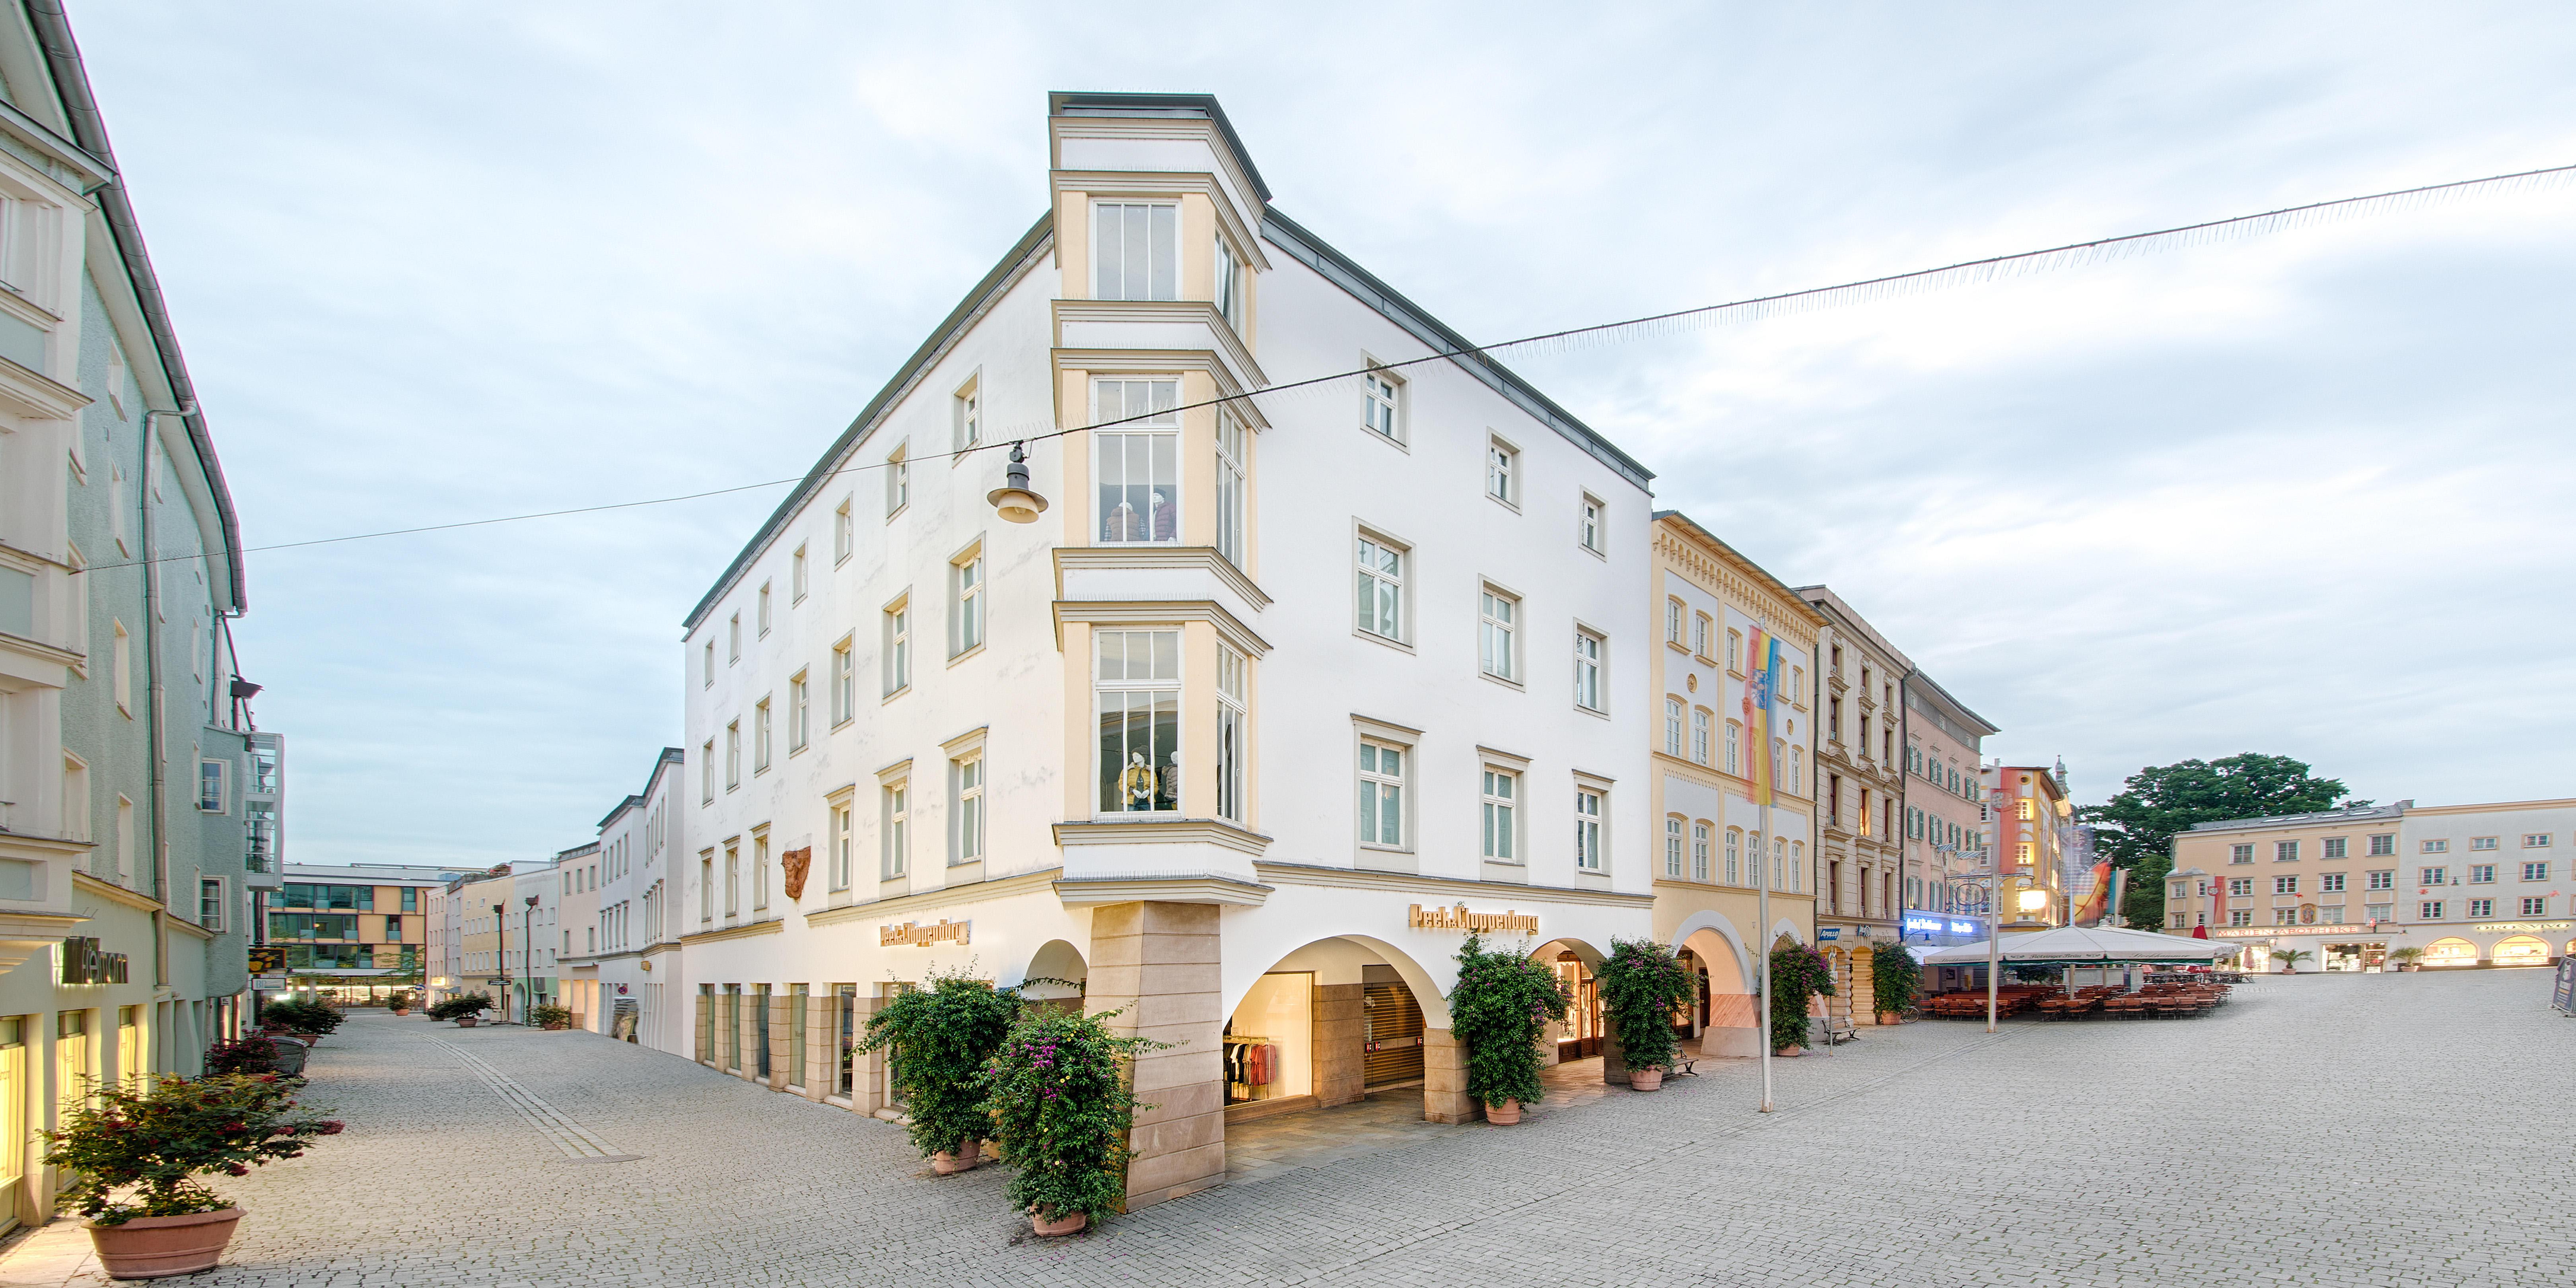 peek & cloppenburg - 7 bewertungen - rosenheim in oberbayern